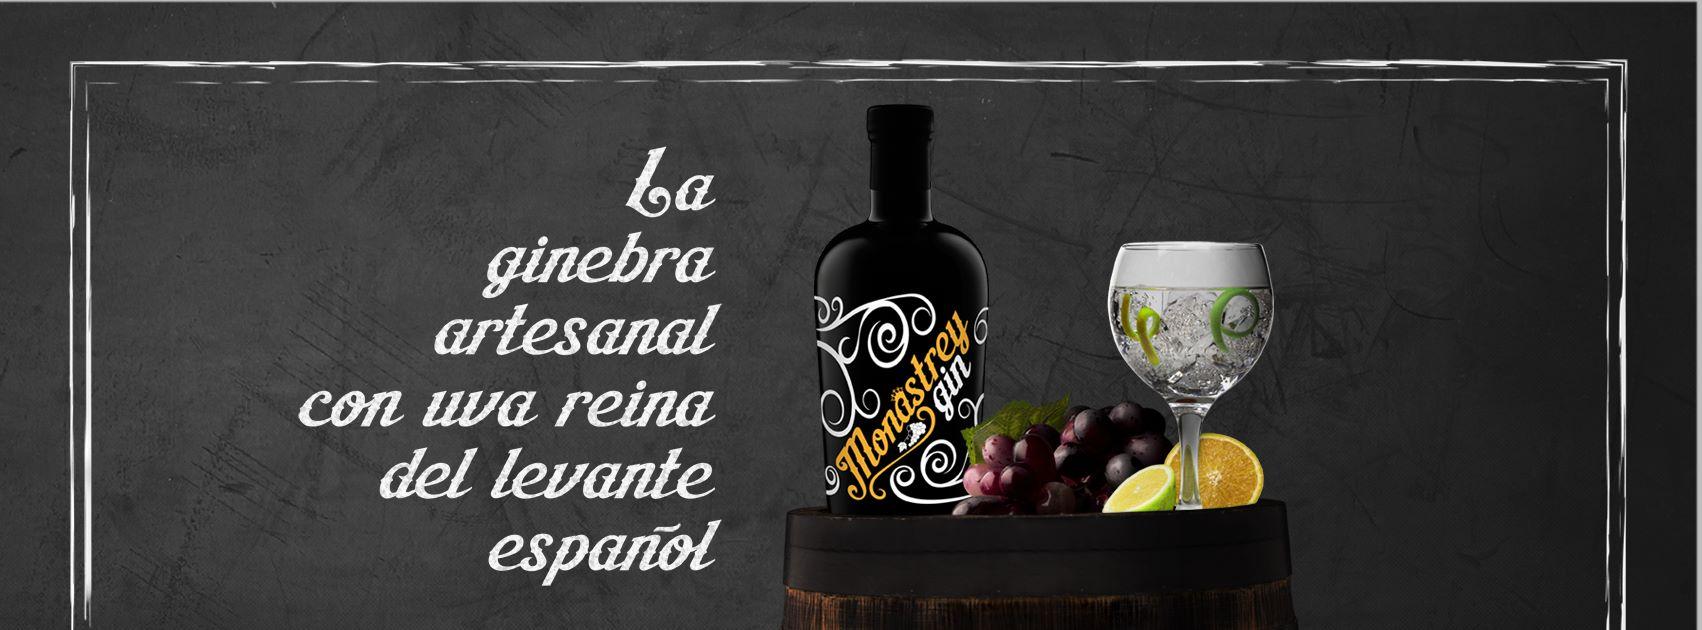 Monastrey, ginebra artesanal con la uva reina del levante español